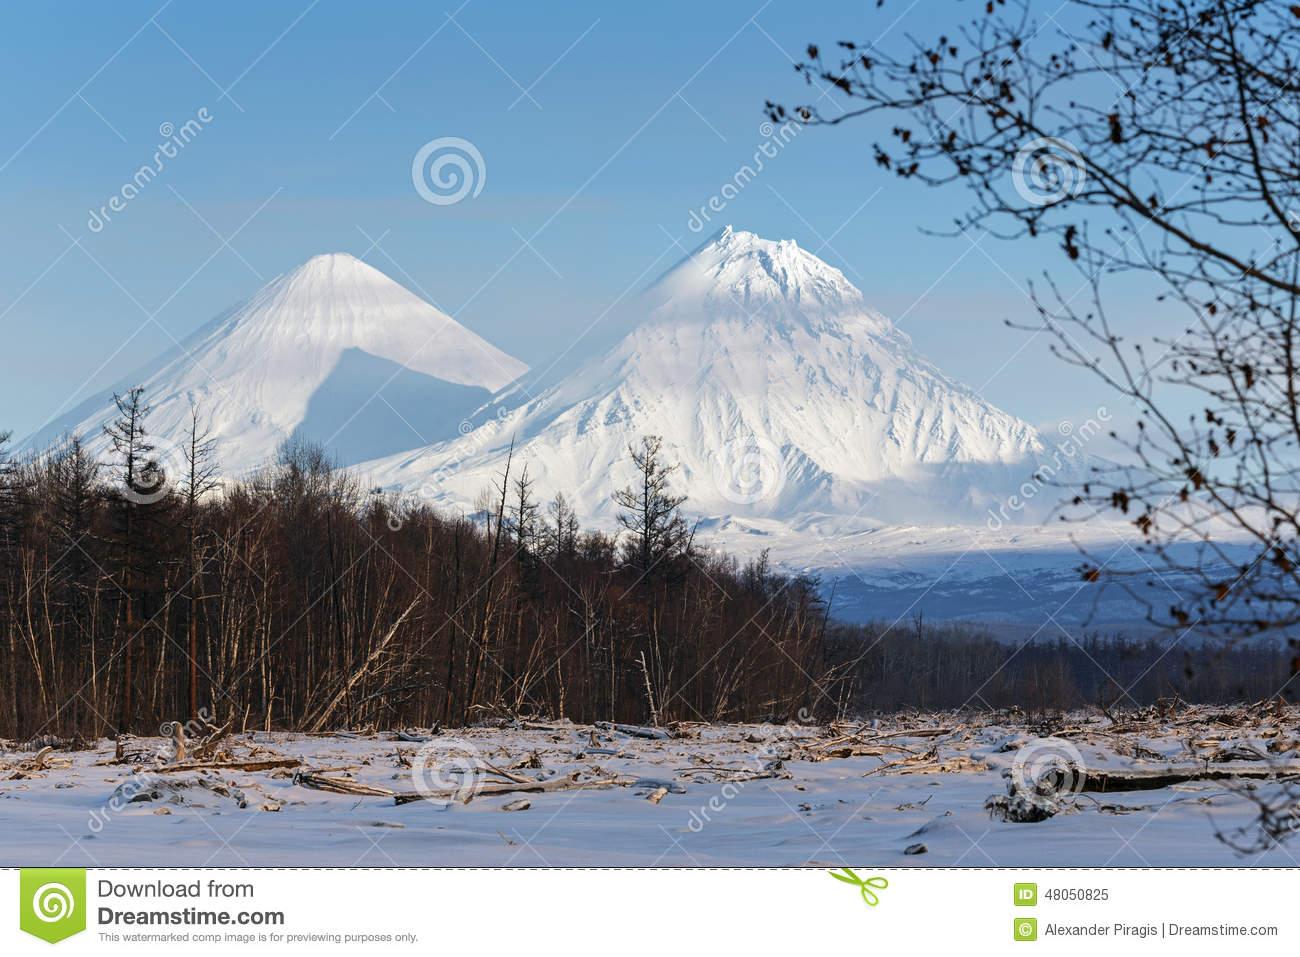 Kamchatka Peninsula clipart #20, Download drawings